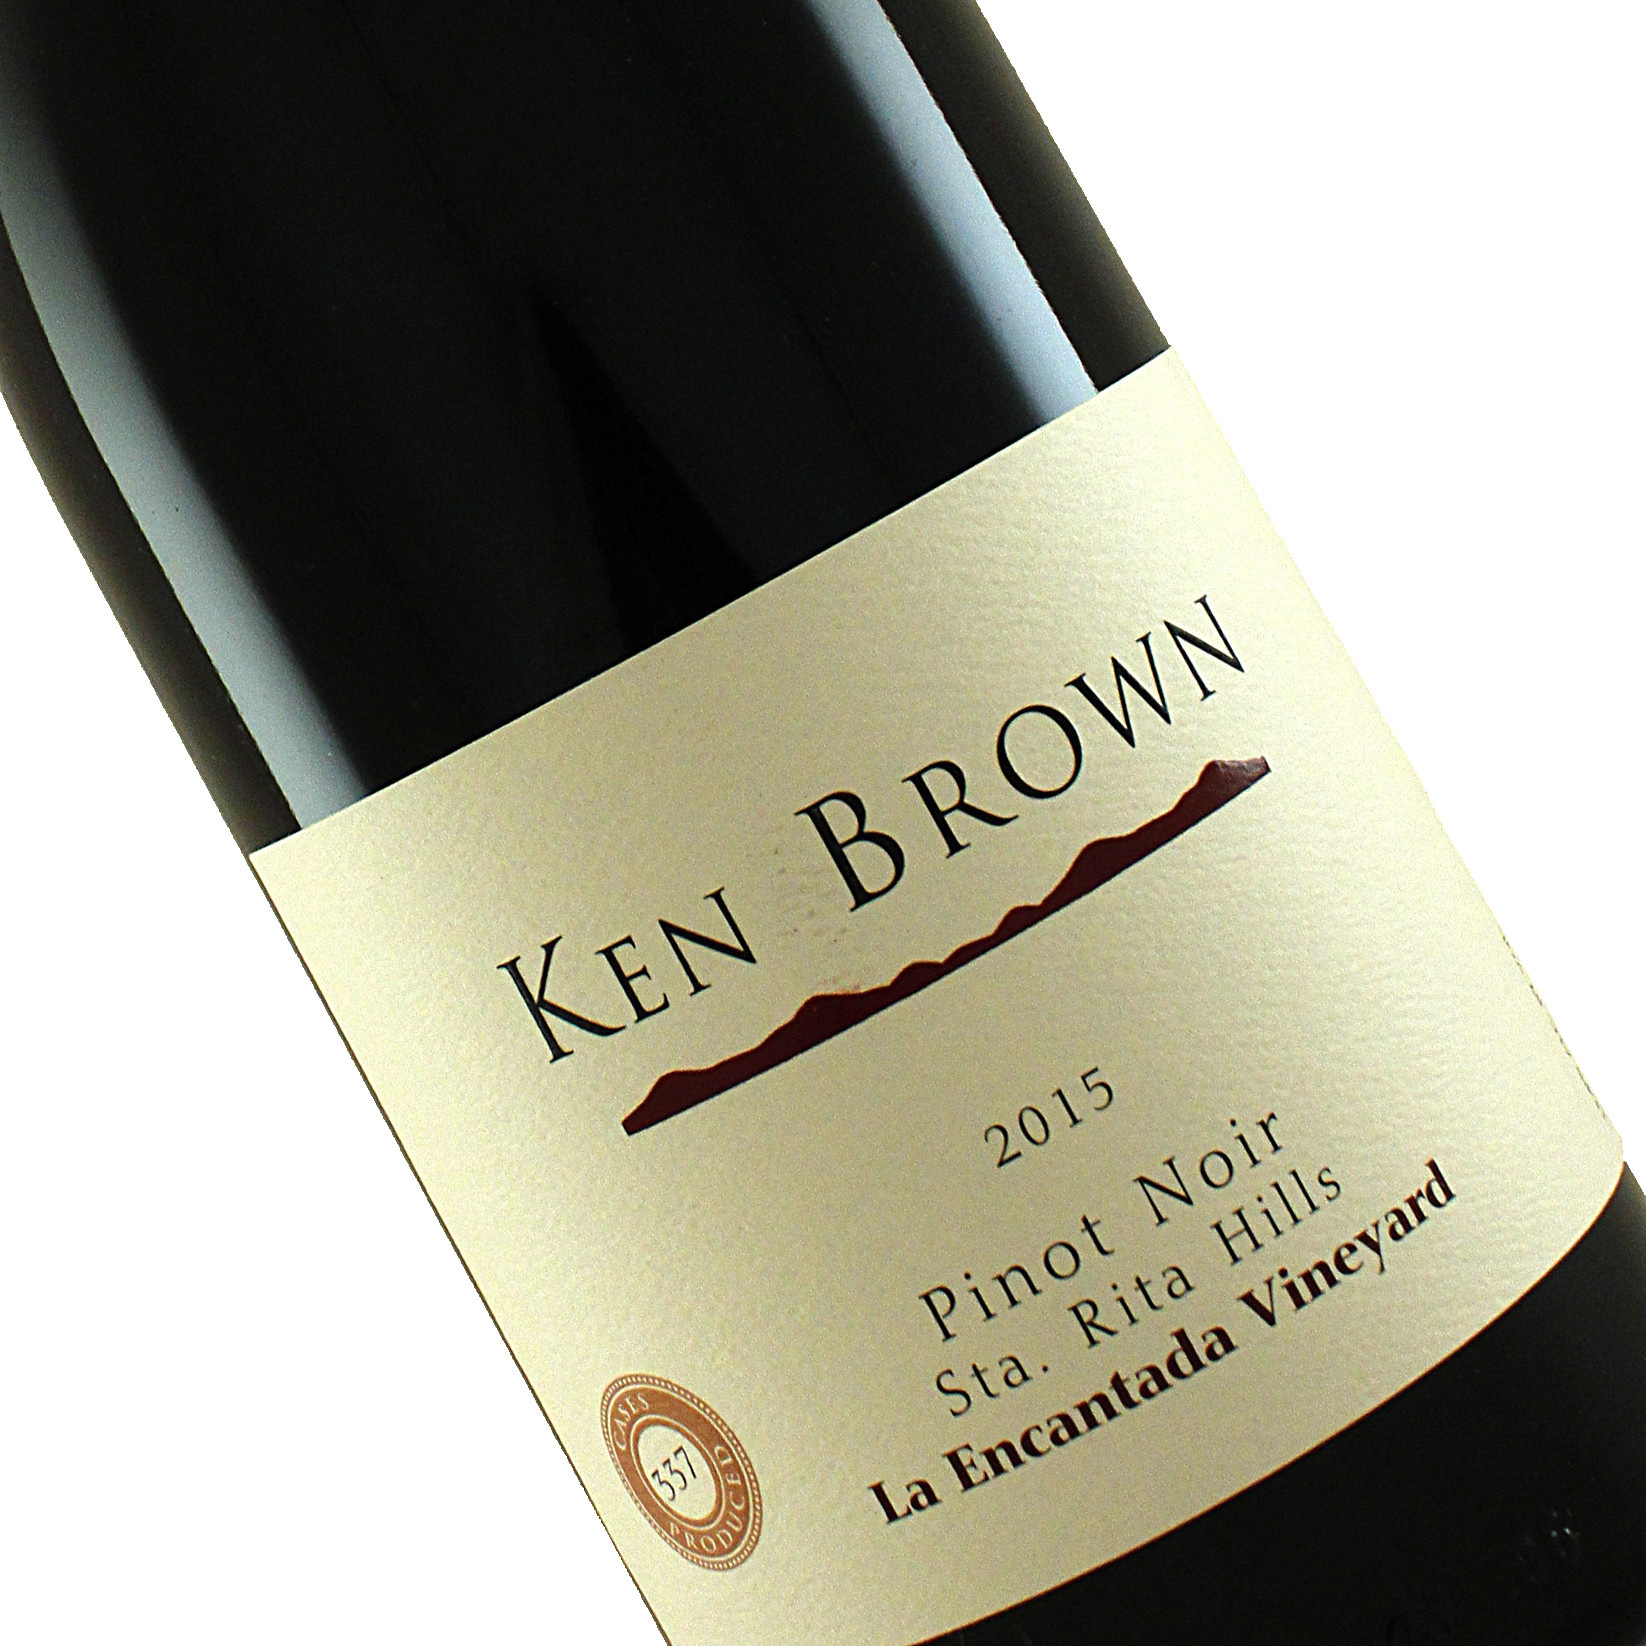 Ken Brown 2015 Pinot Noir La Encantada Vineyard, Sta. Rita Hills